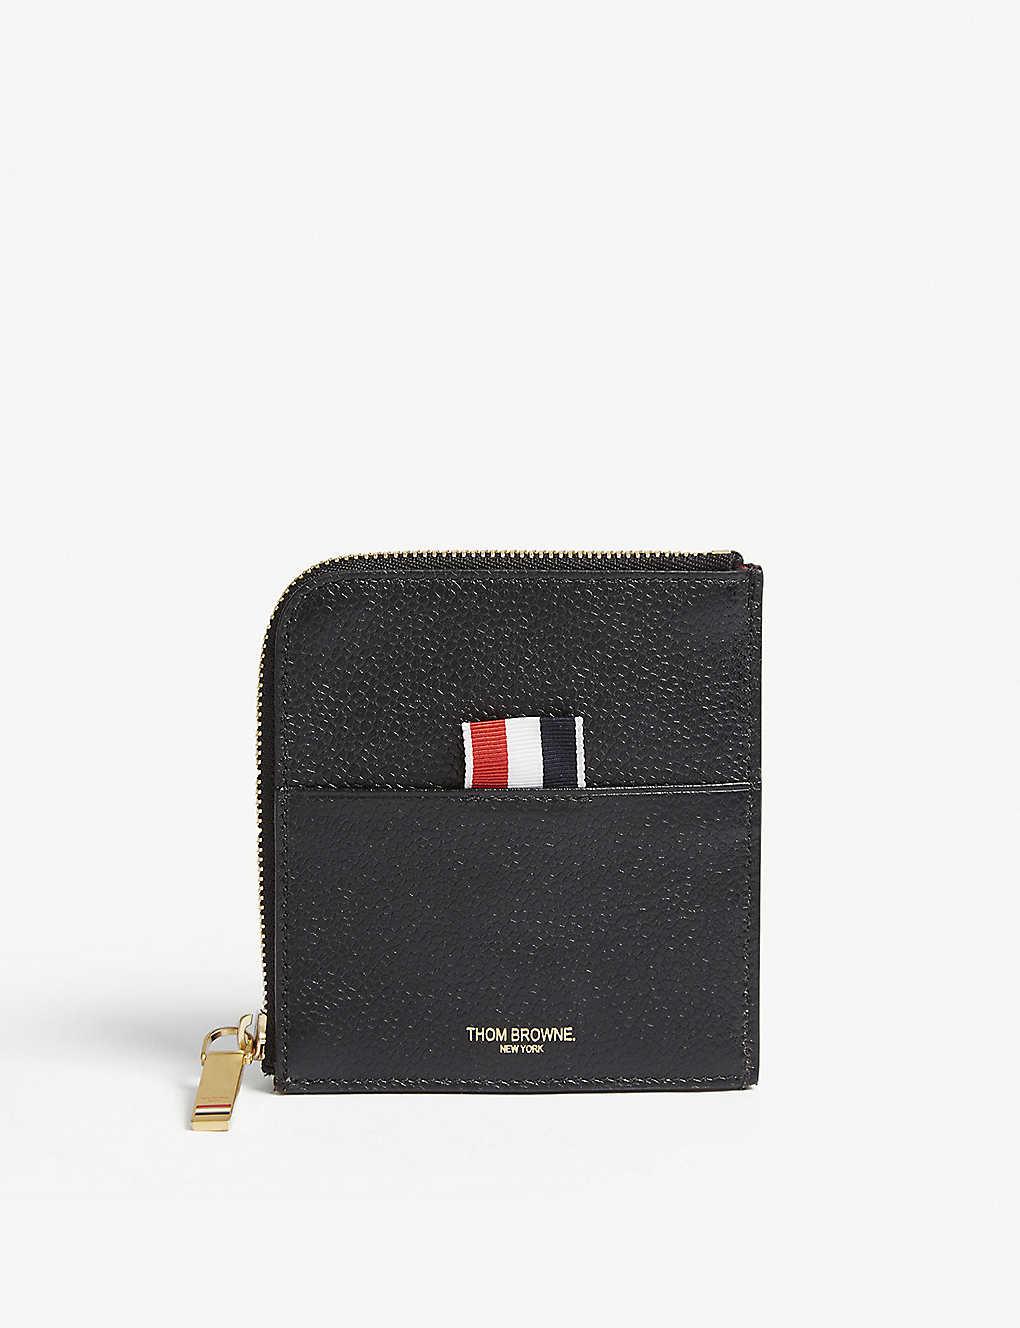 f32ead8ee58b THOM BROWNE - Pebbled leather card wallet | Selfridges.com